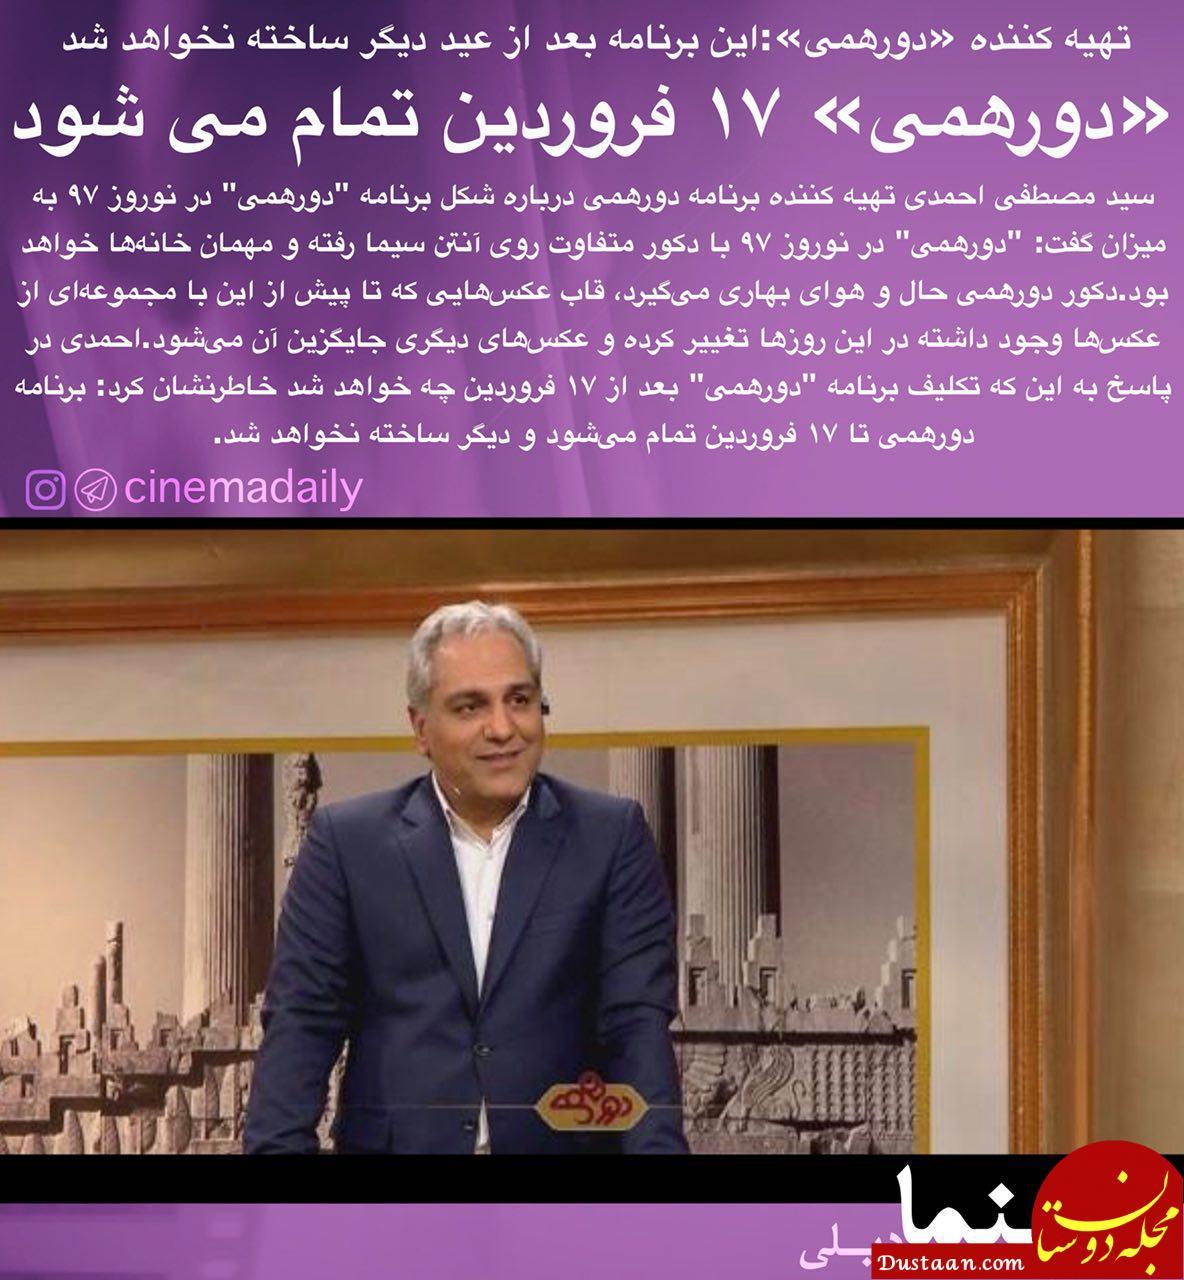 www.dustaan.com «دورهمی» ۱۷ فروردین تمام می شود